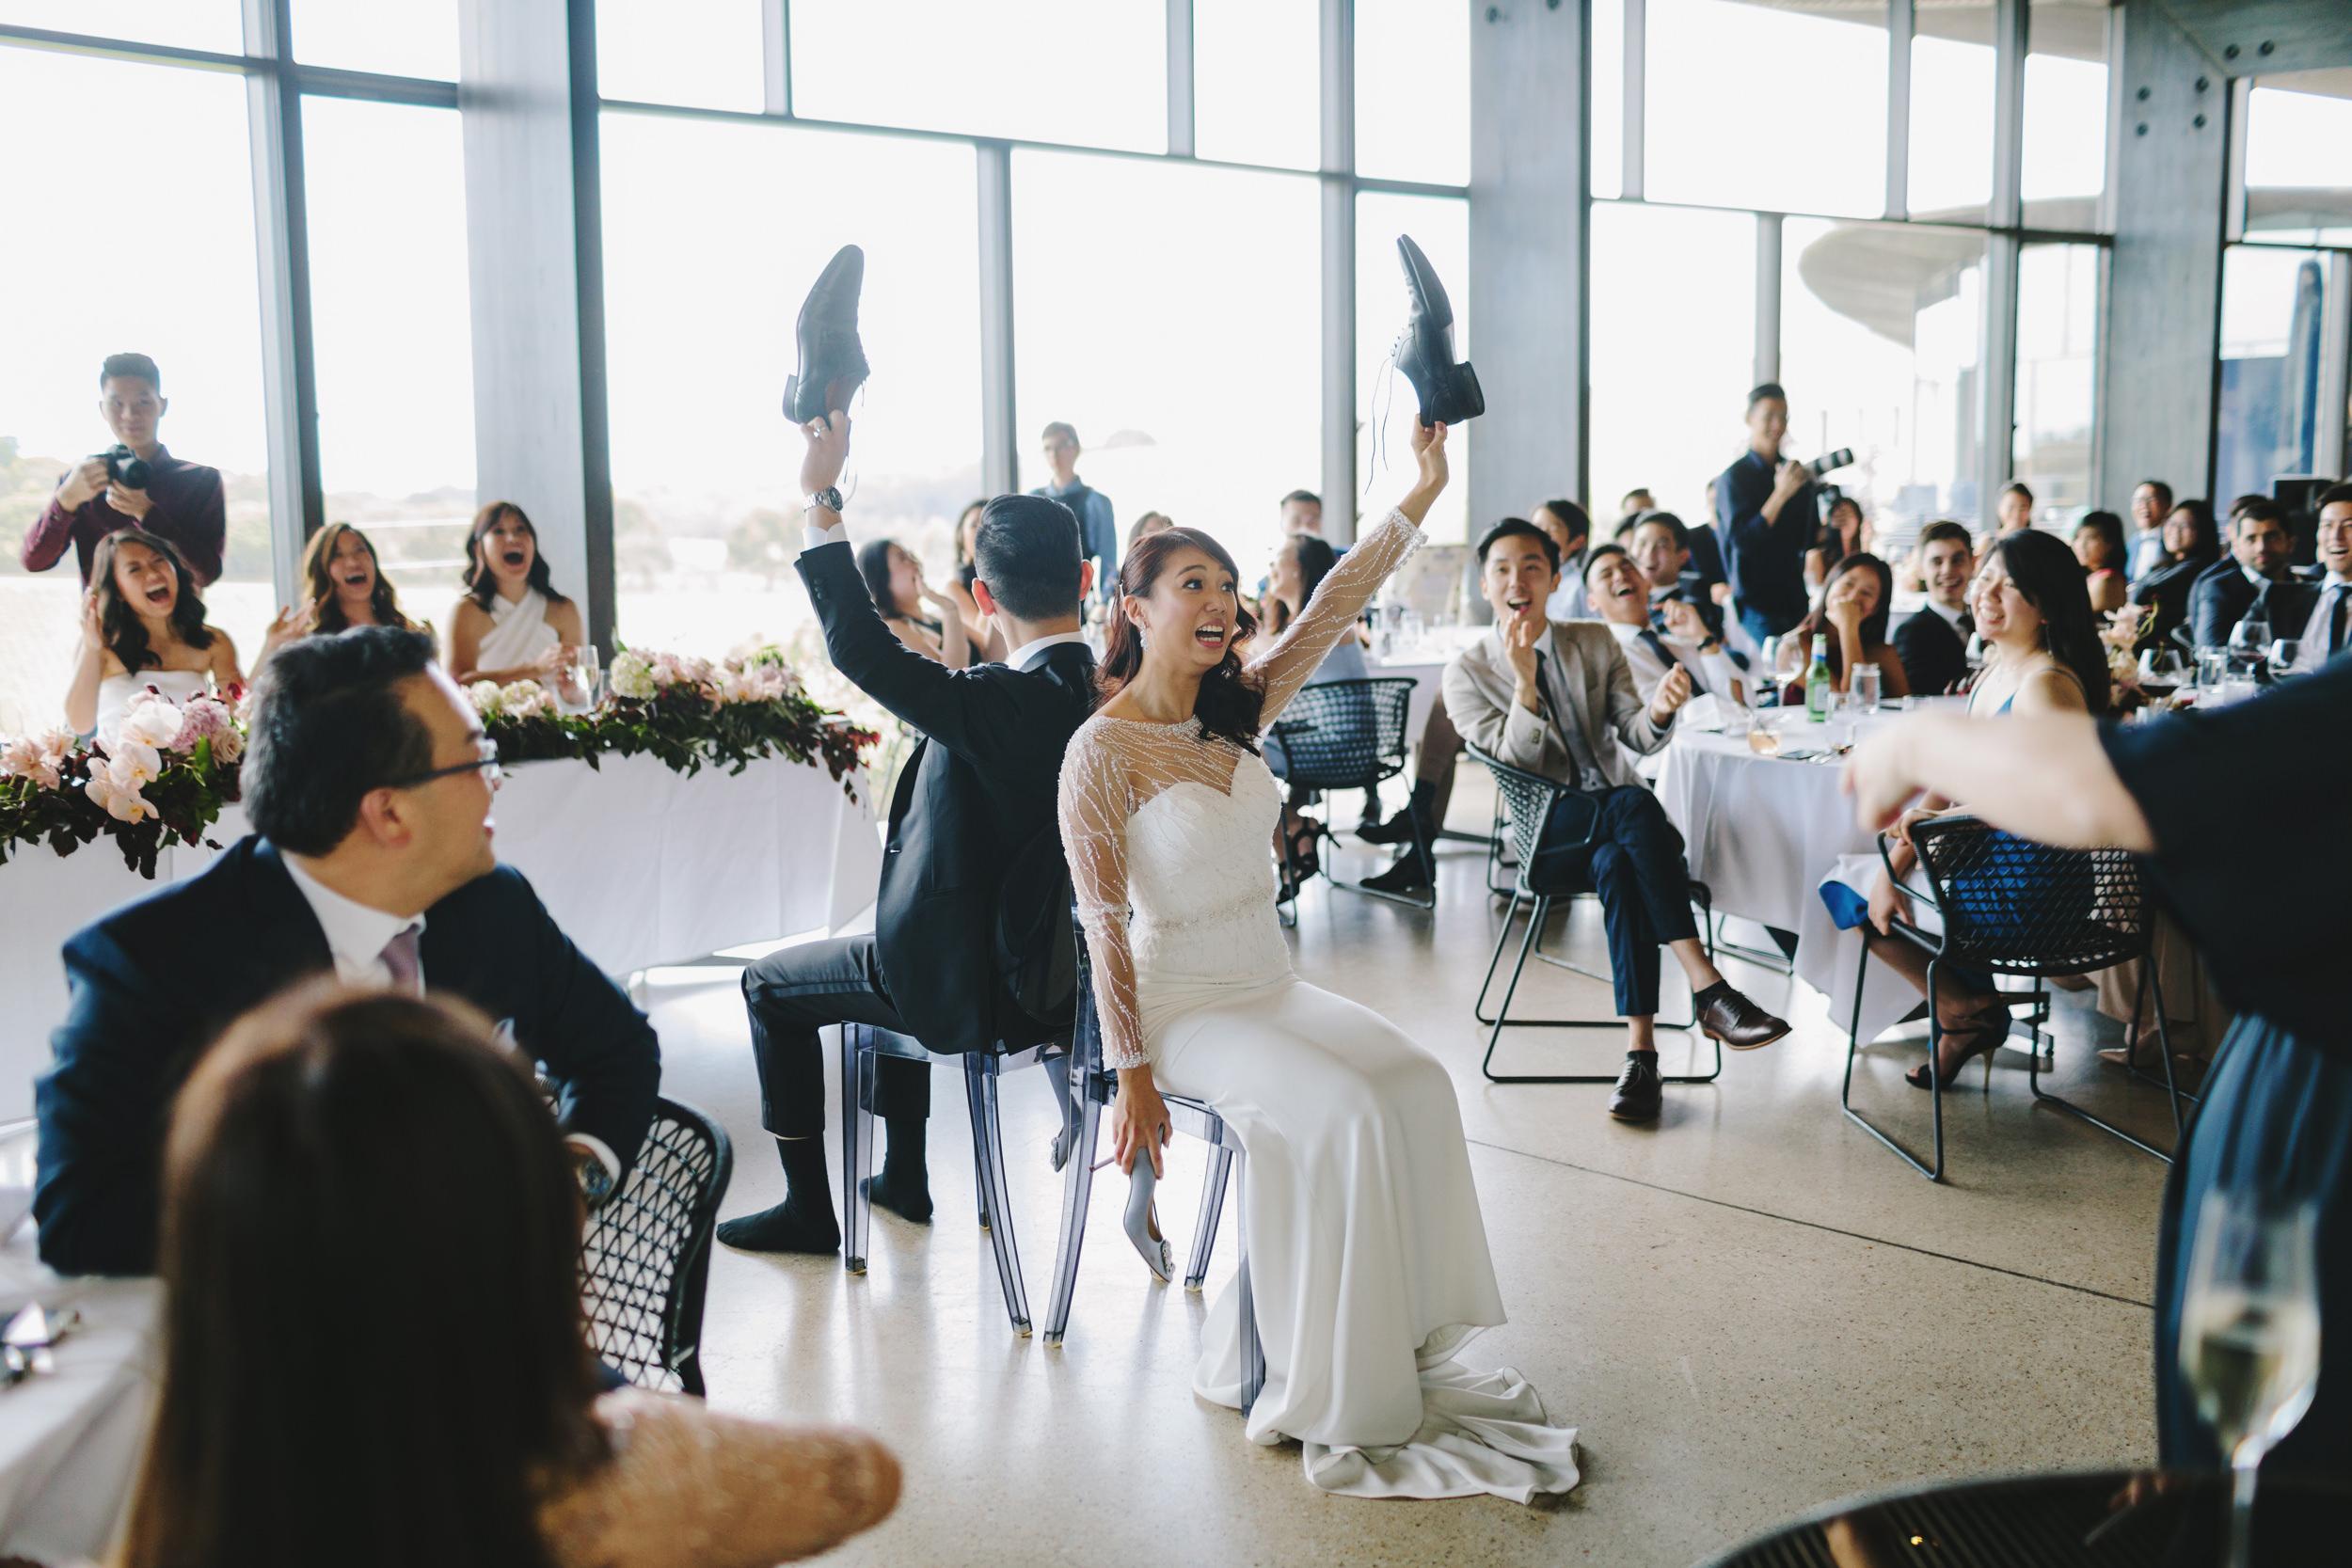 Melbourne Winery Wedding Daryl & Adeline 81.JPG